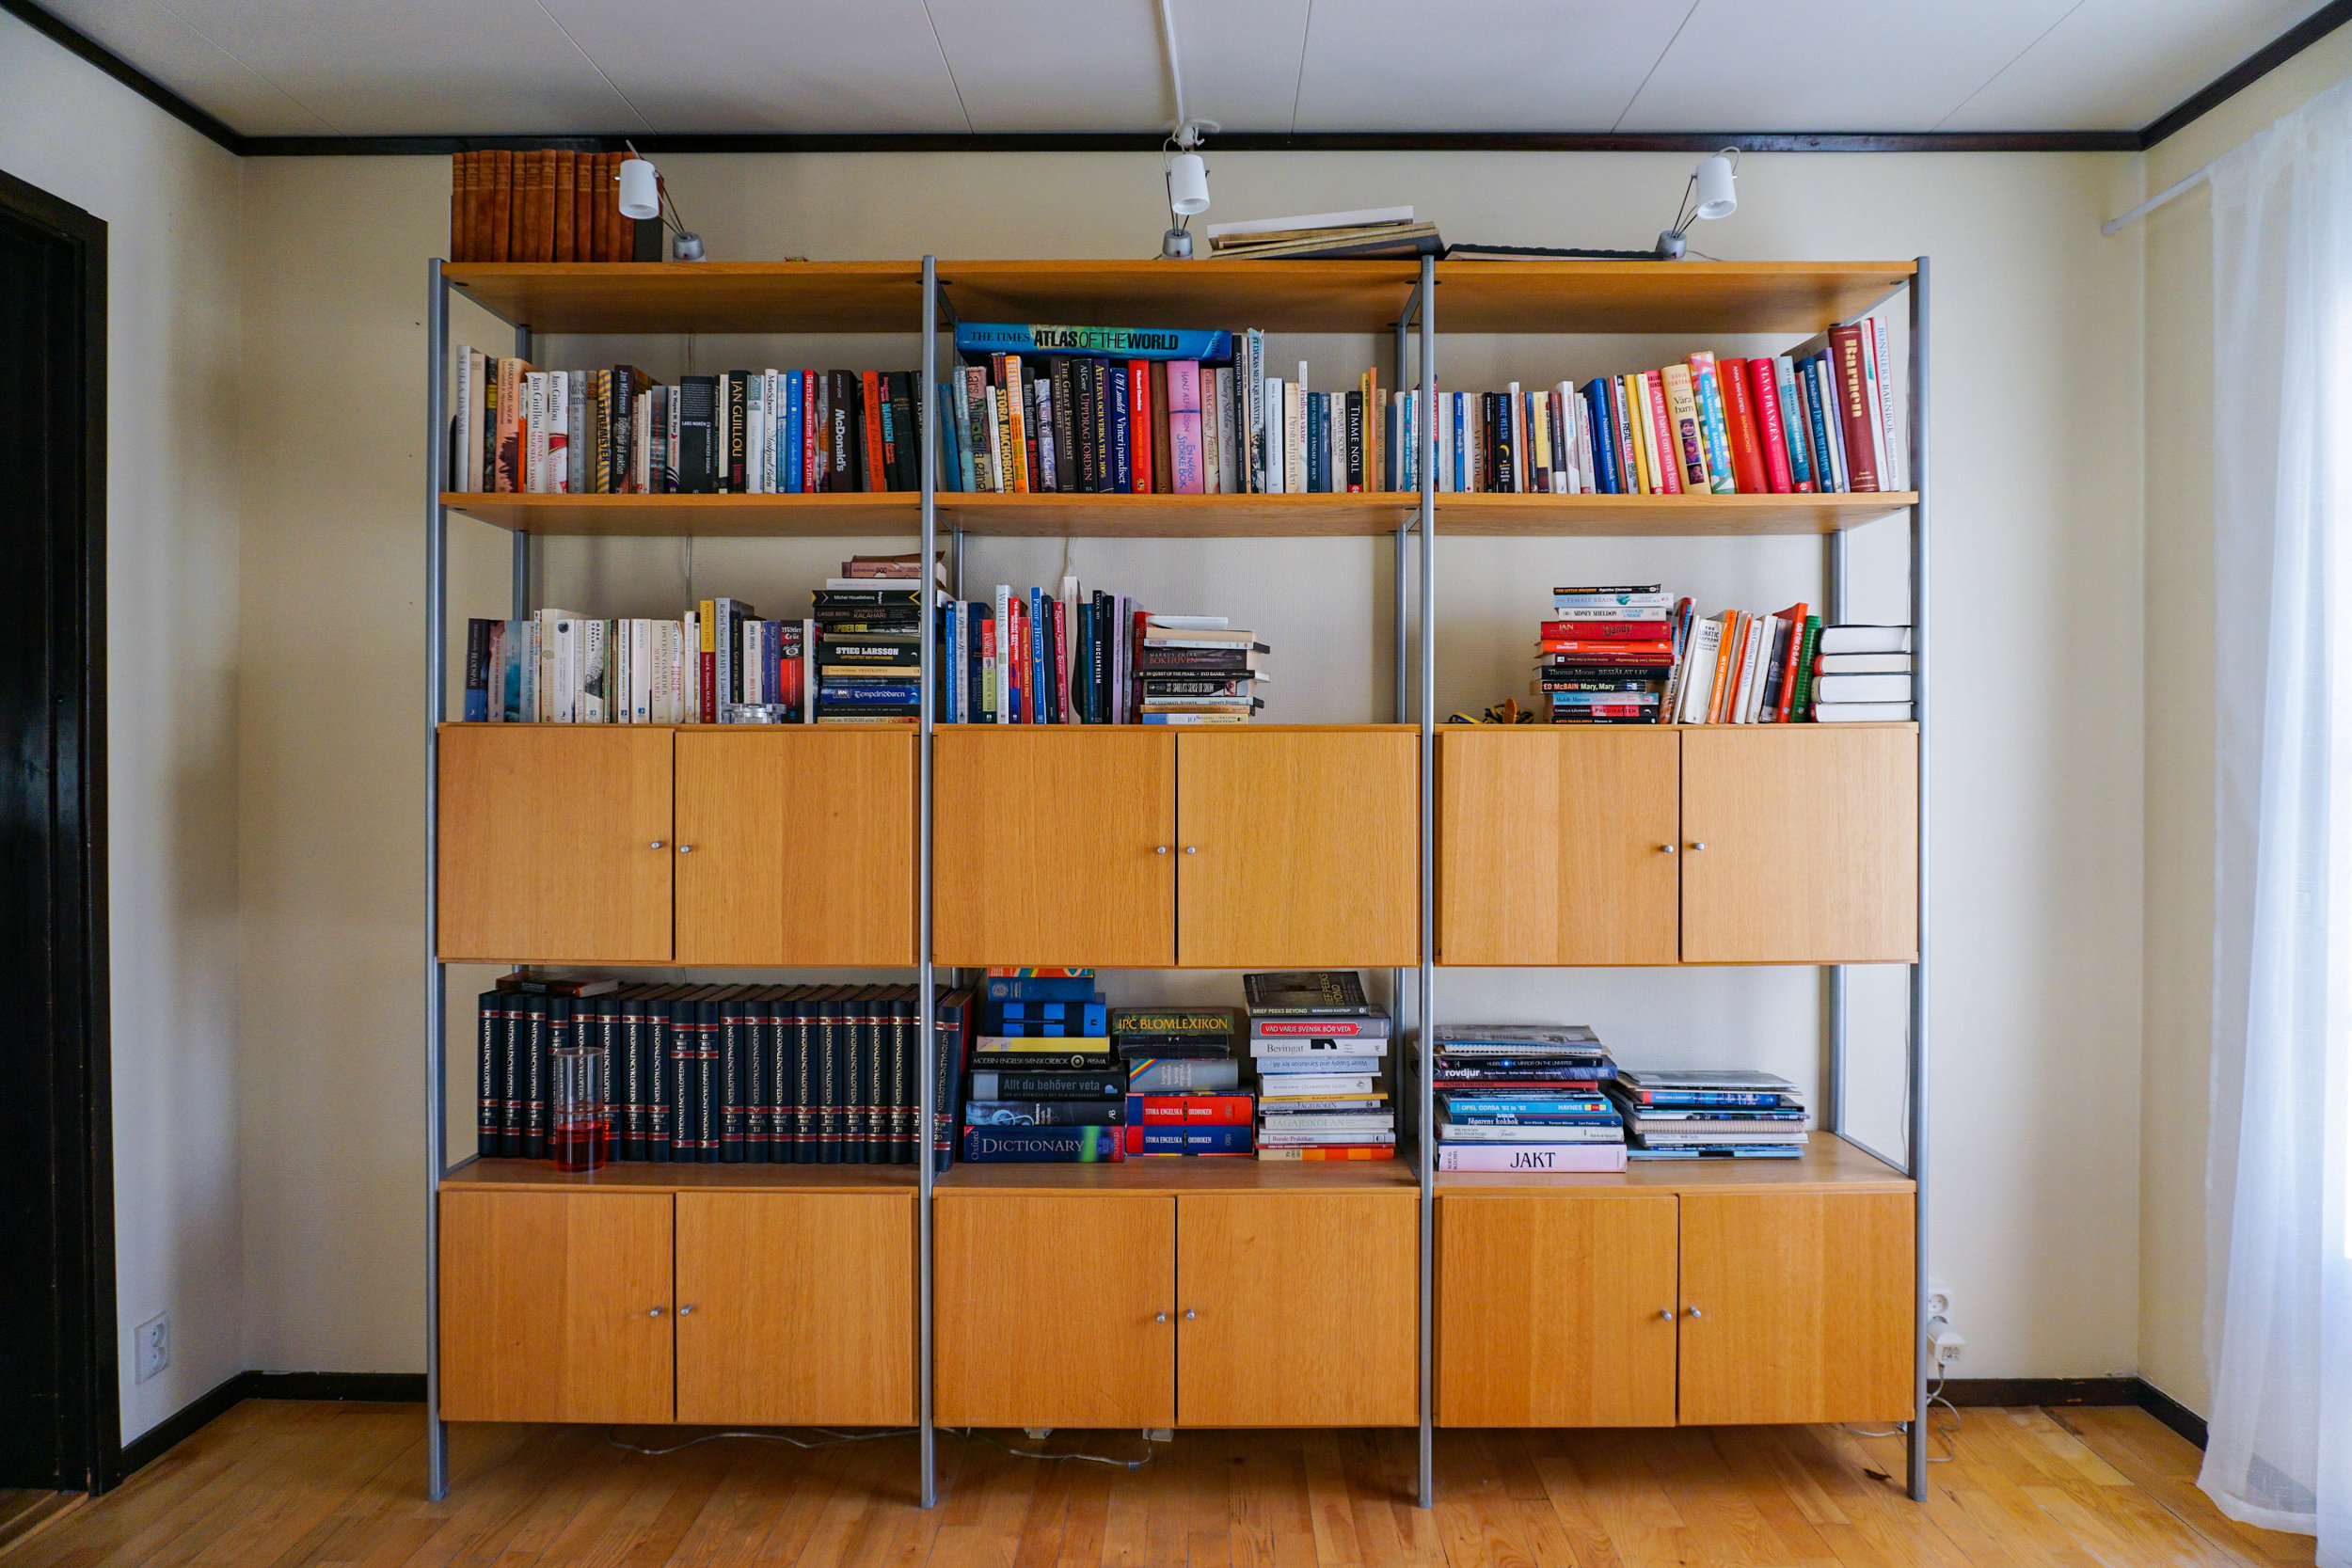 Karen Roldan - AirBNB - Skarpang, Taby - Bookshelf.jpg